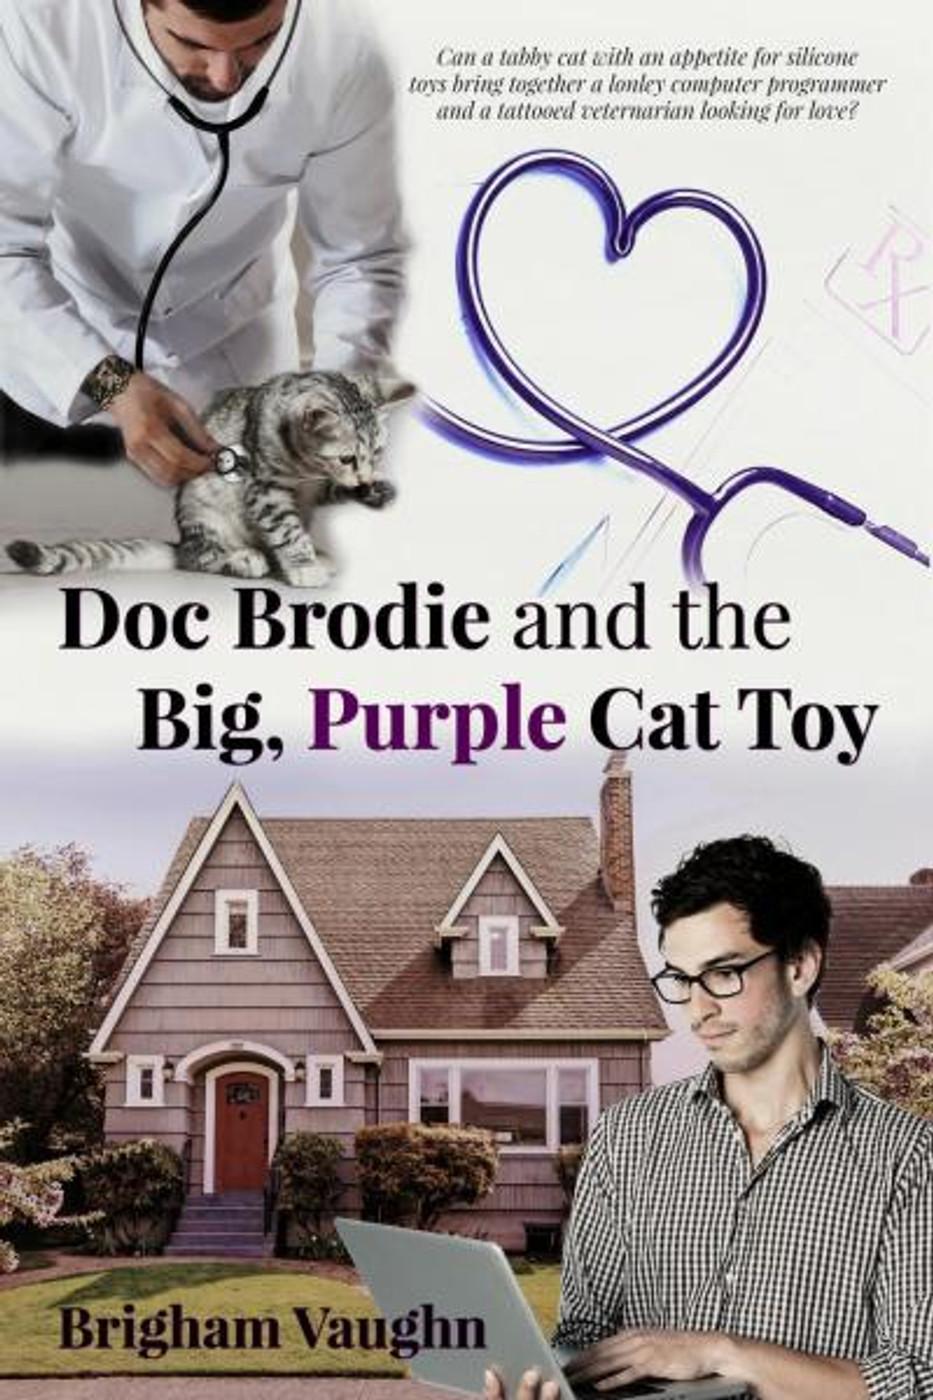 Doc Brodie and the Big, Purple Cat Toy - Brigham Vaughn